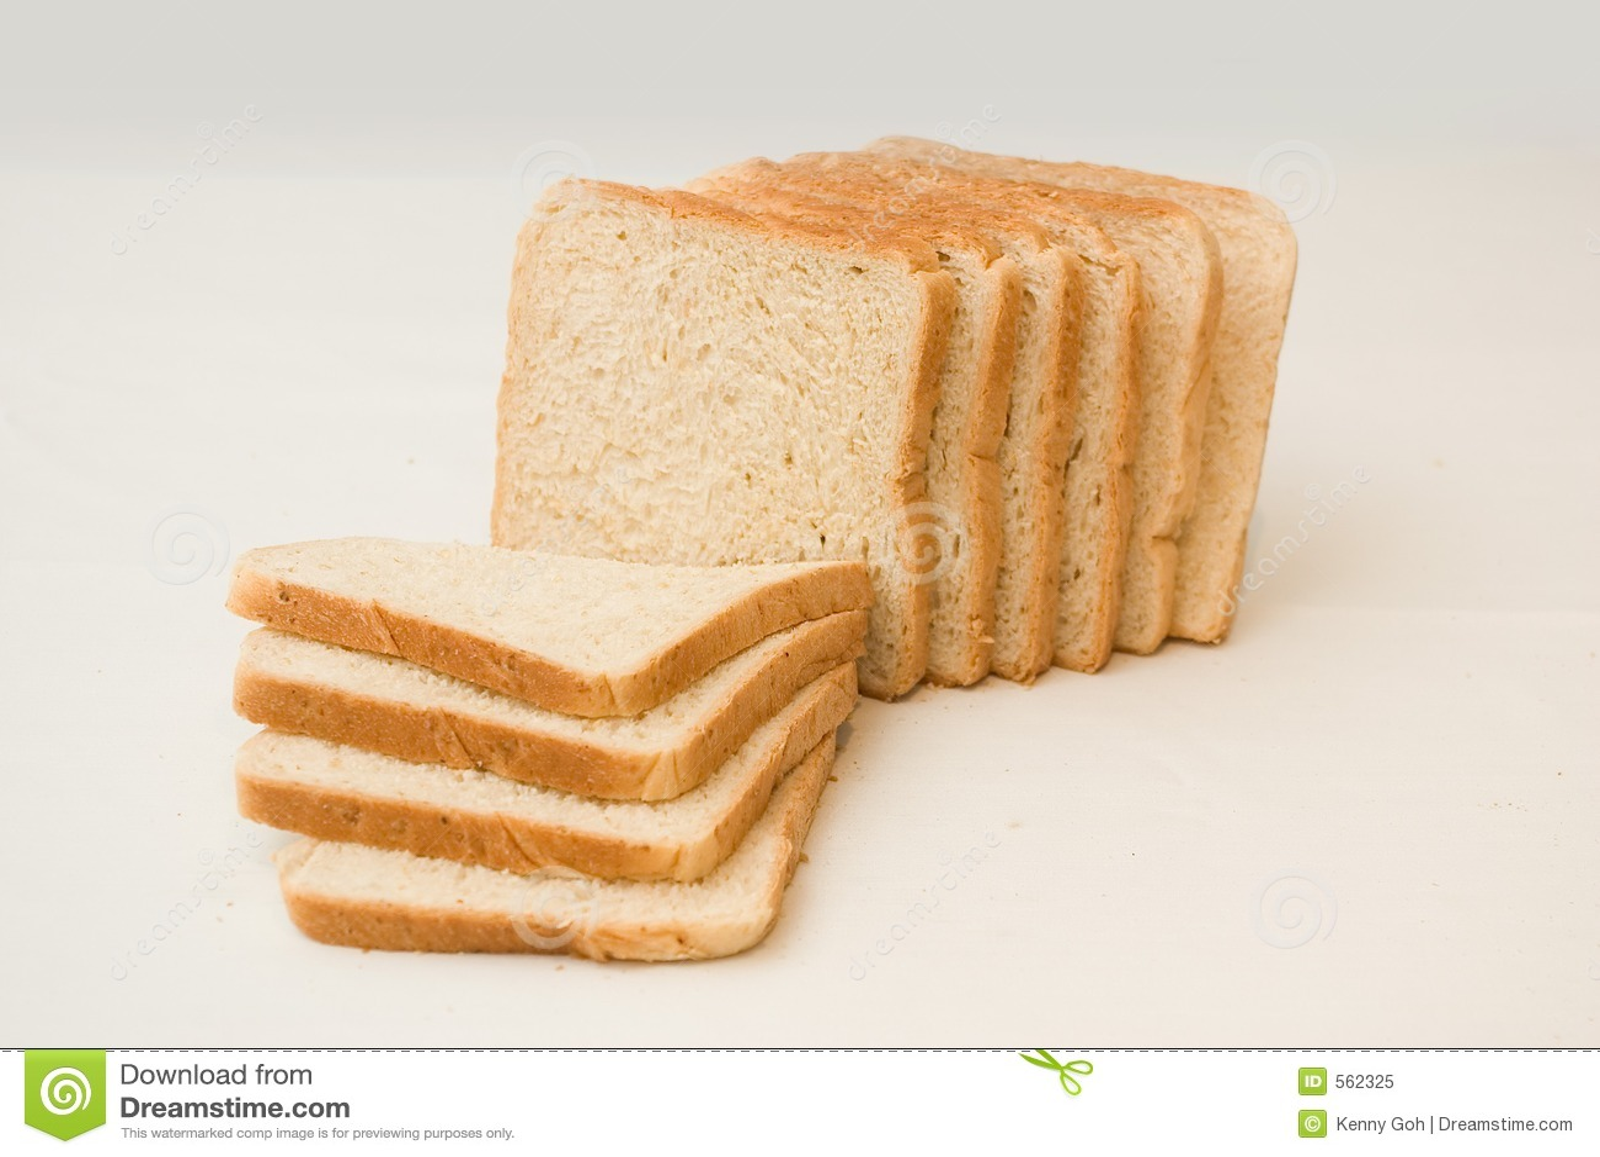 Sliced Bread Loaf Stock Image Image Of Brown Supper